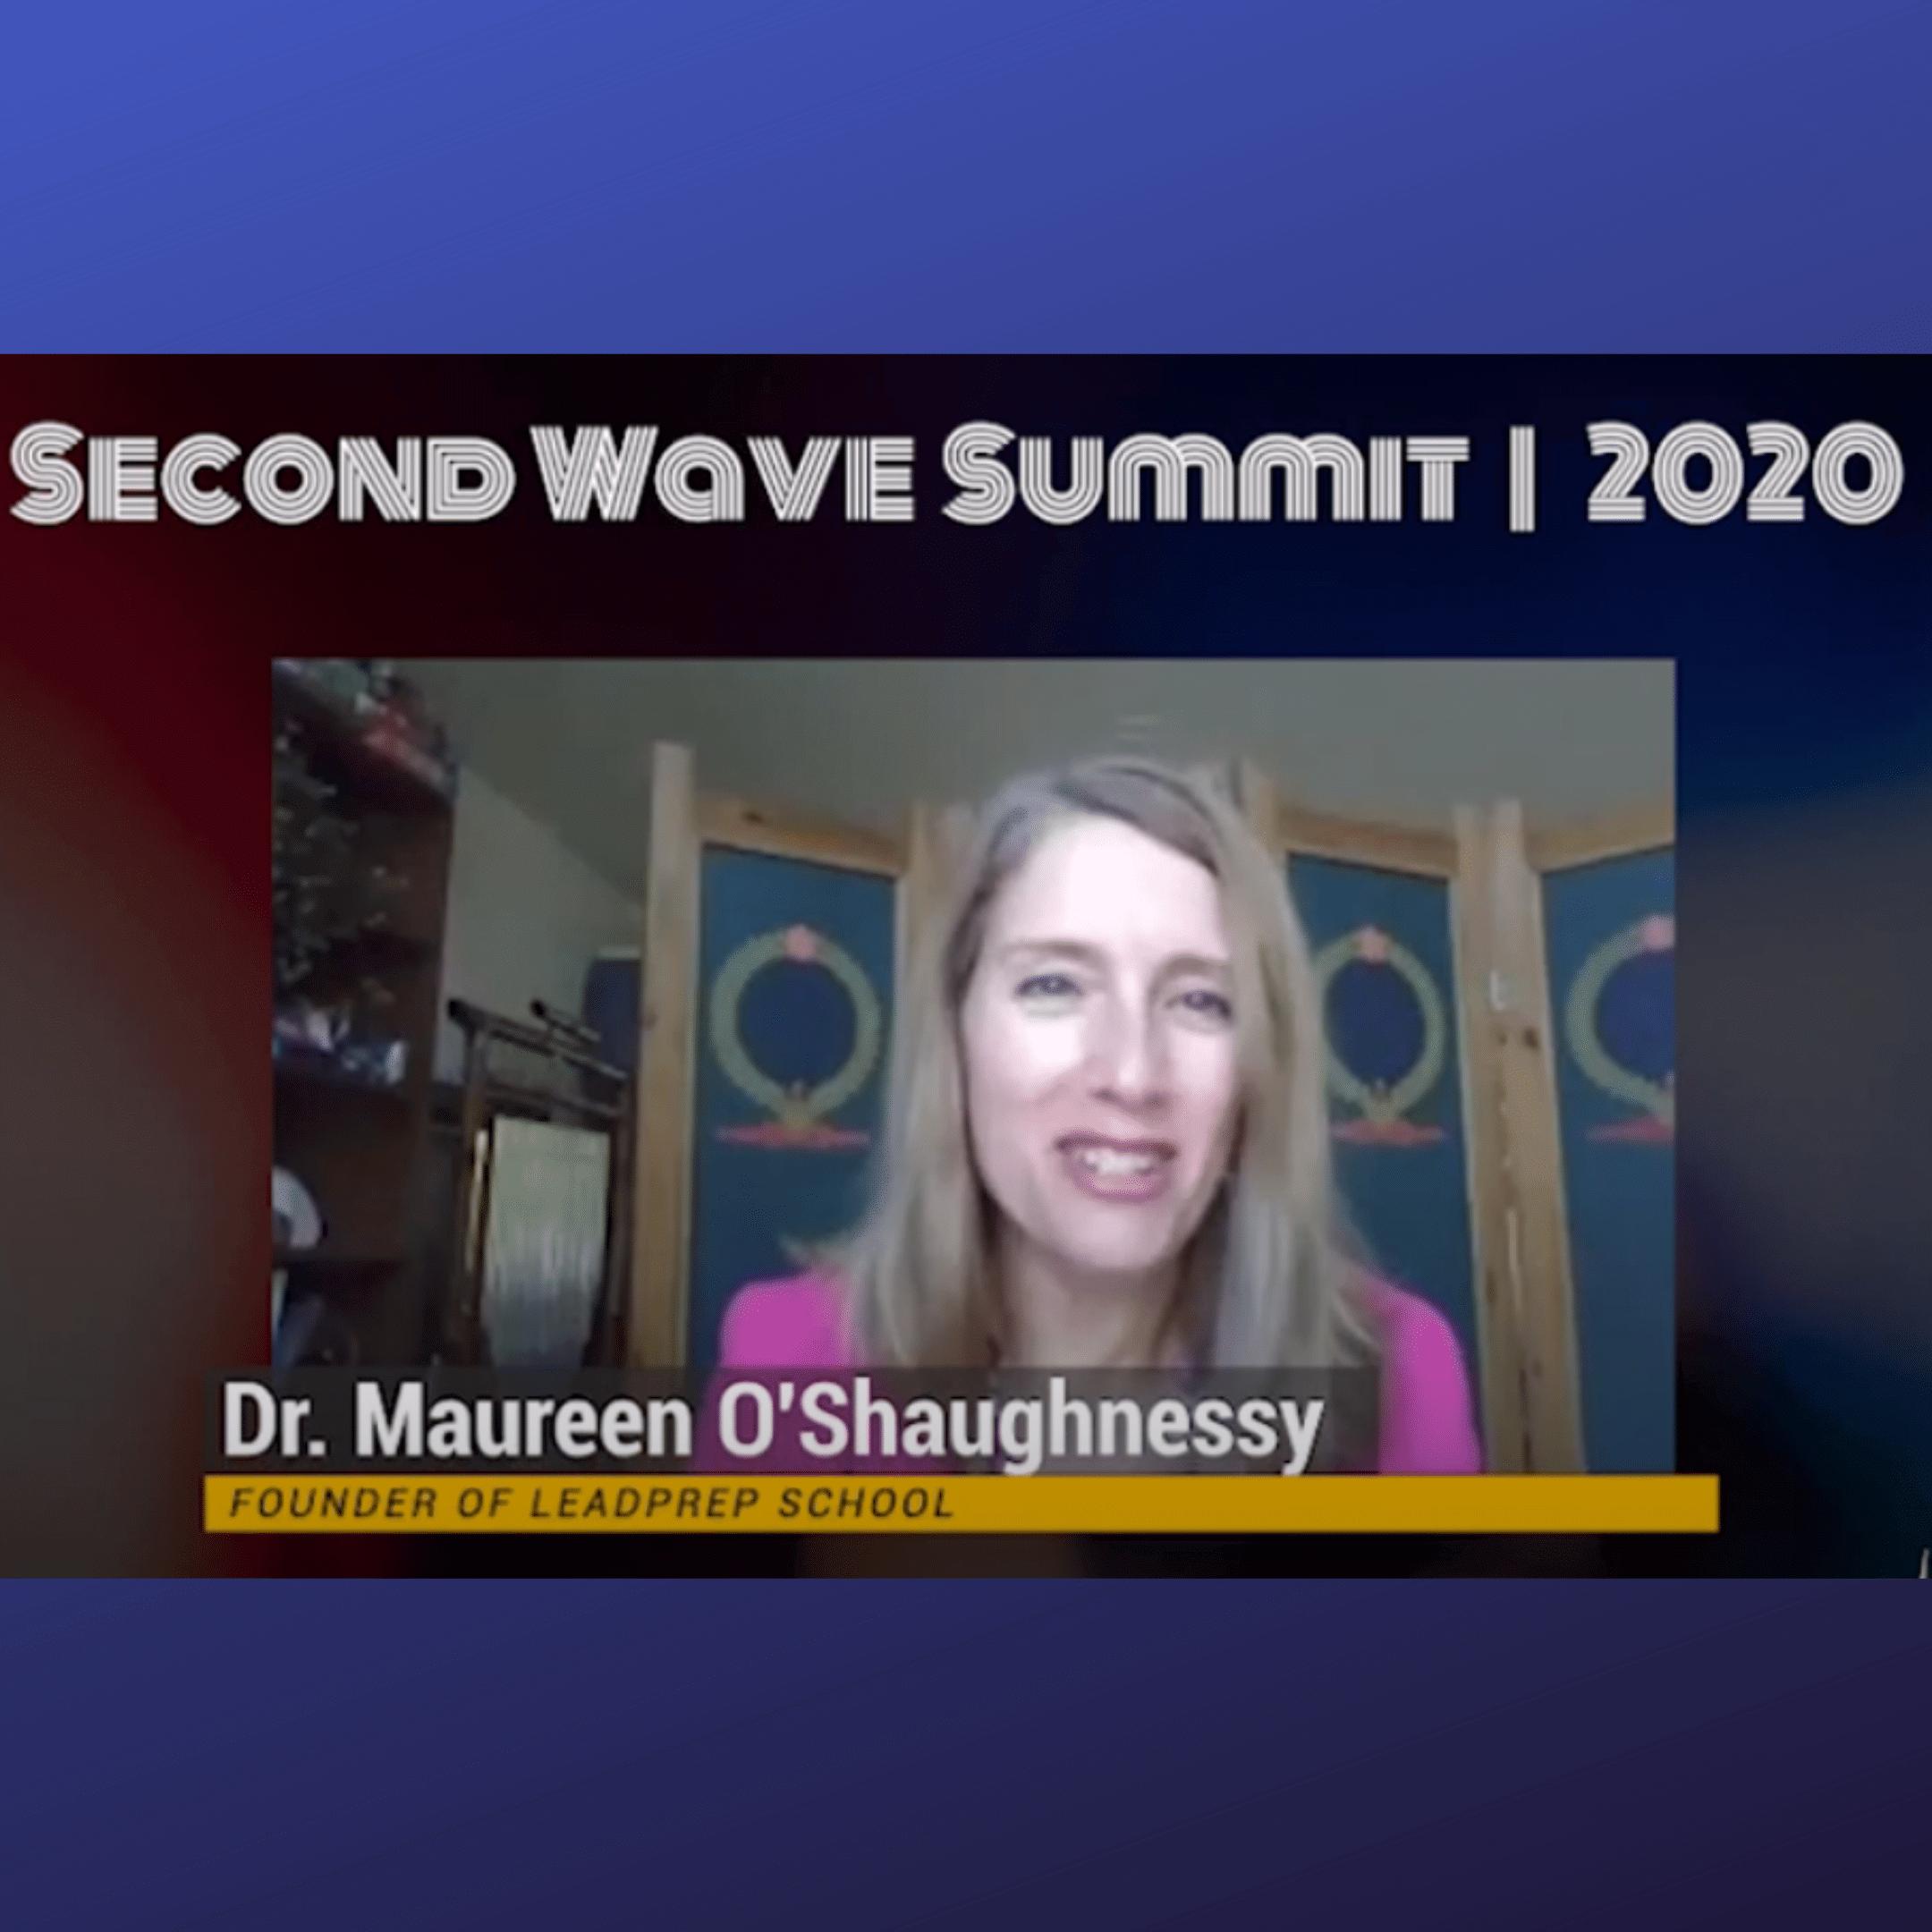 Second Wave Summit 2020